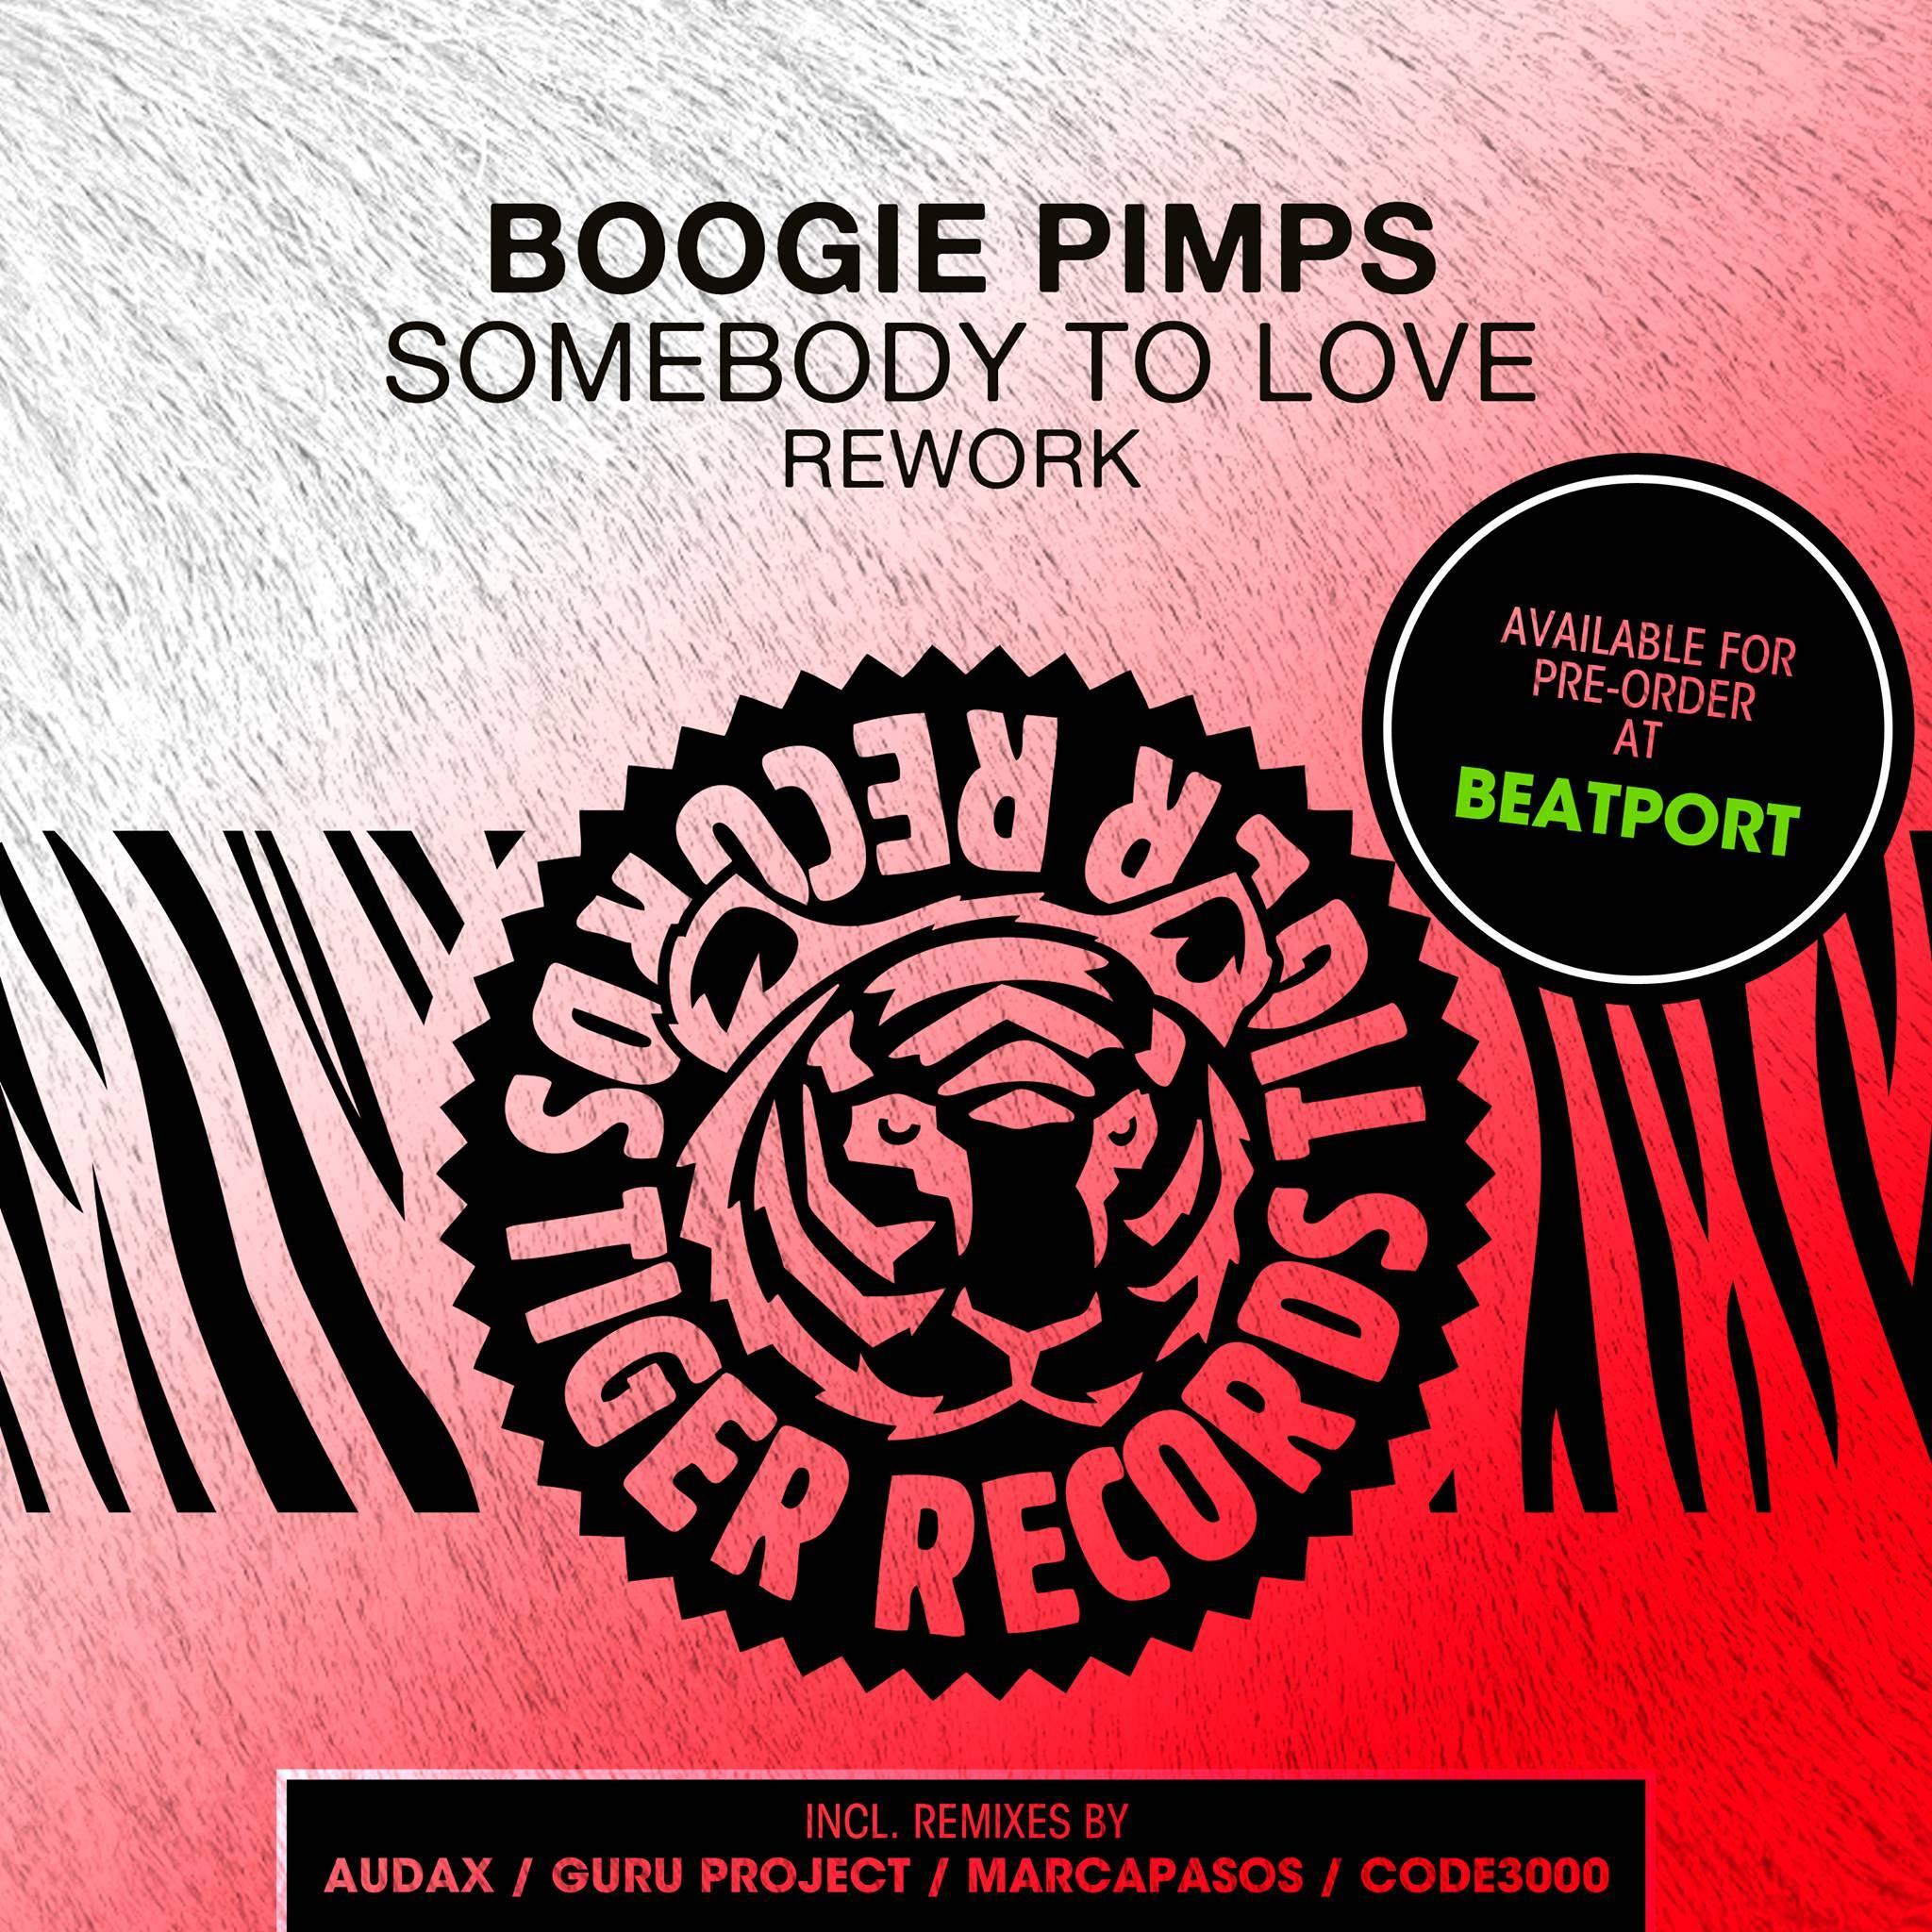 Somebody to Love - Rework